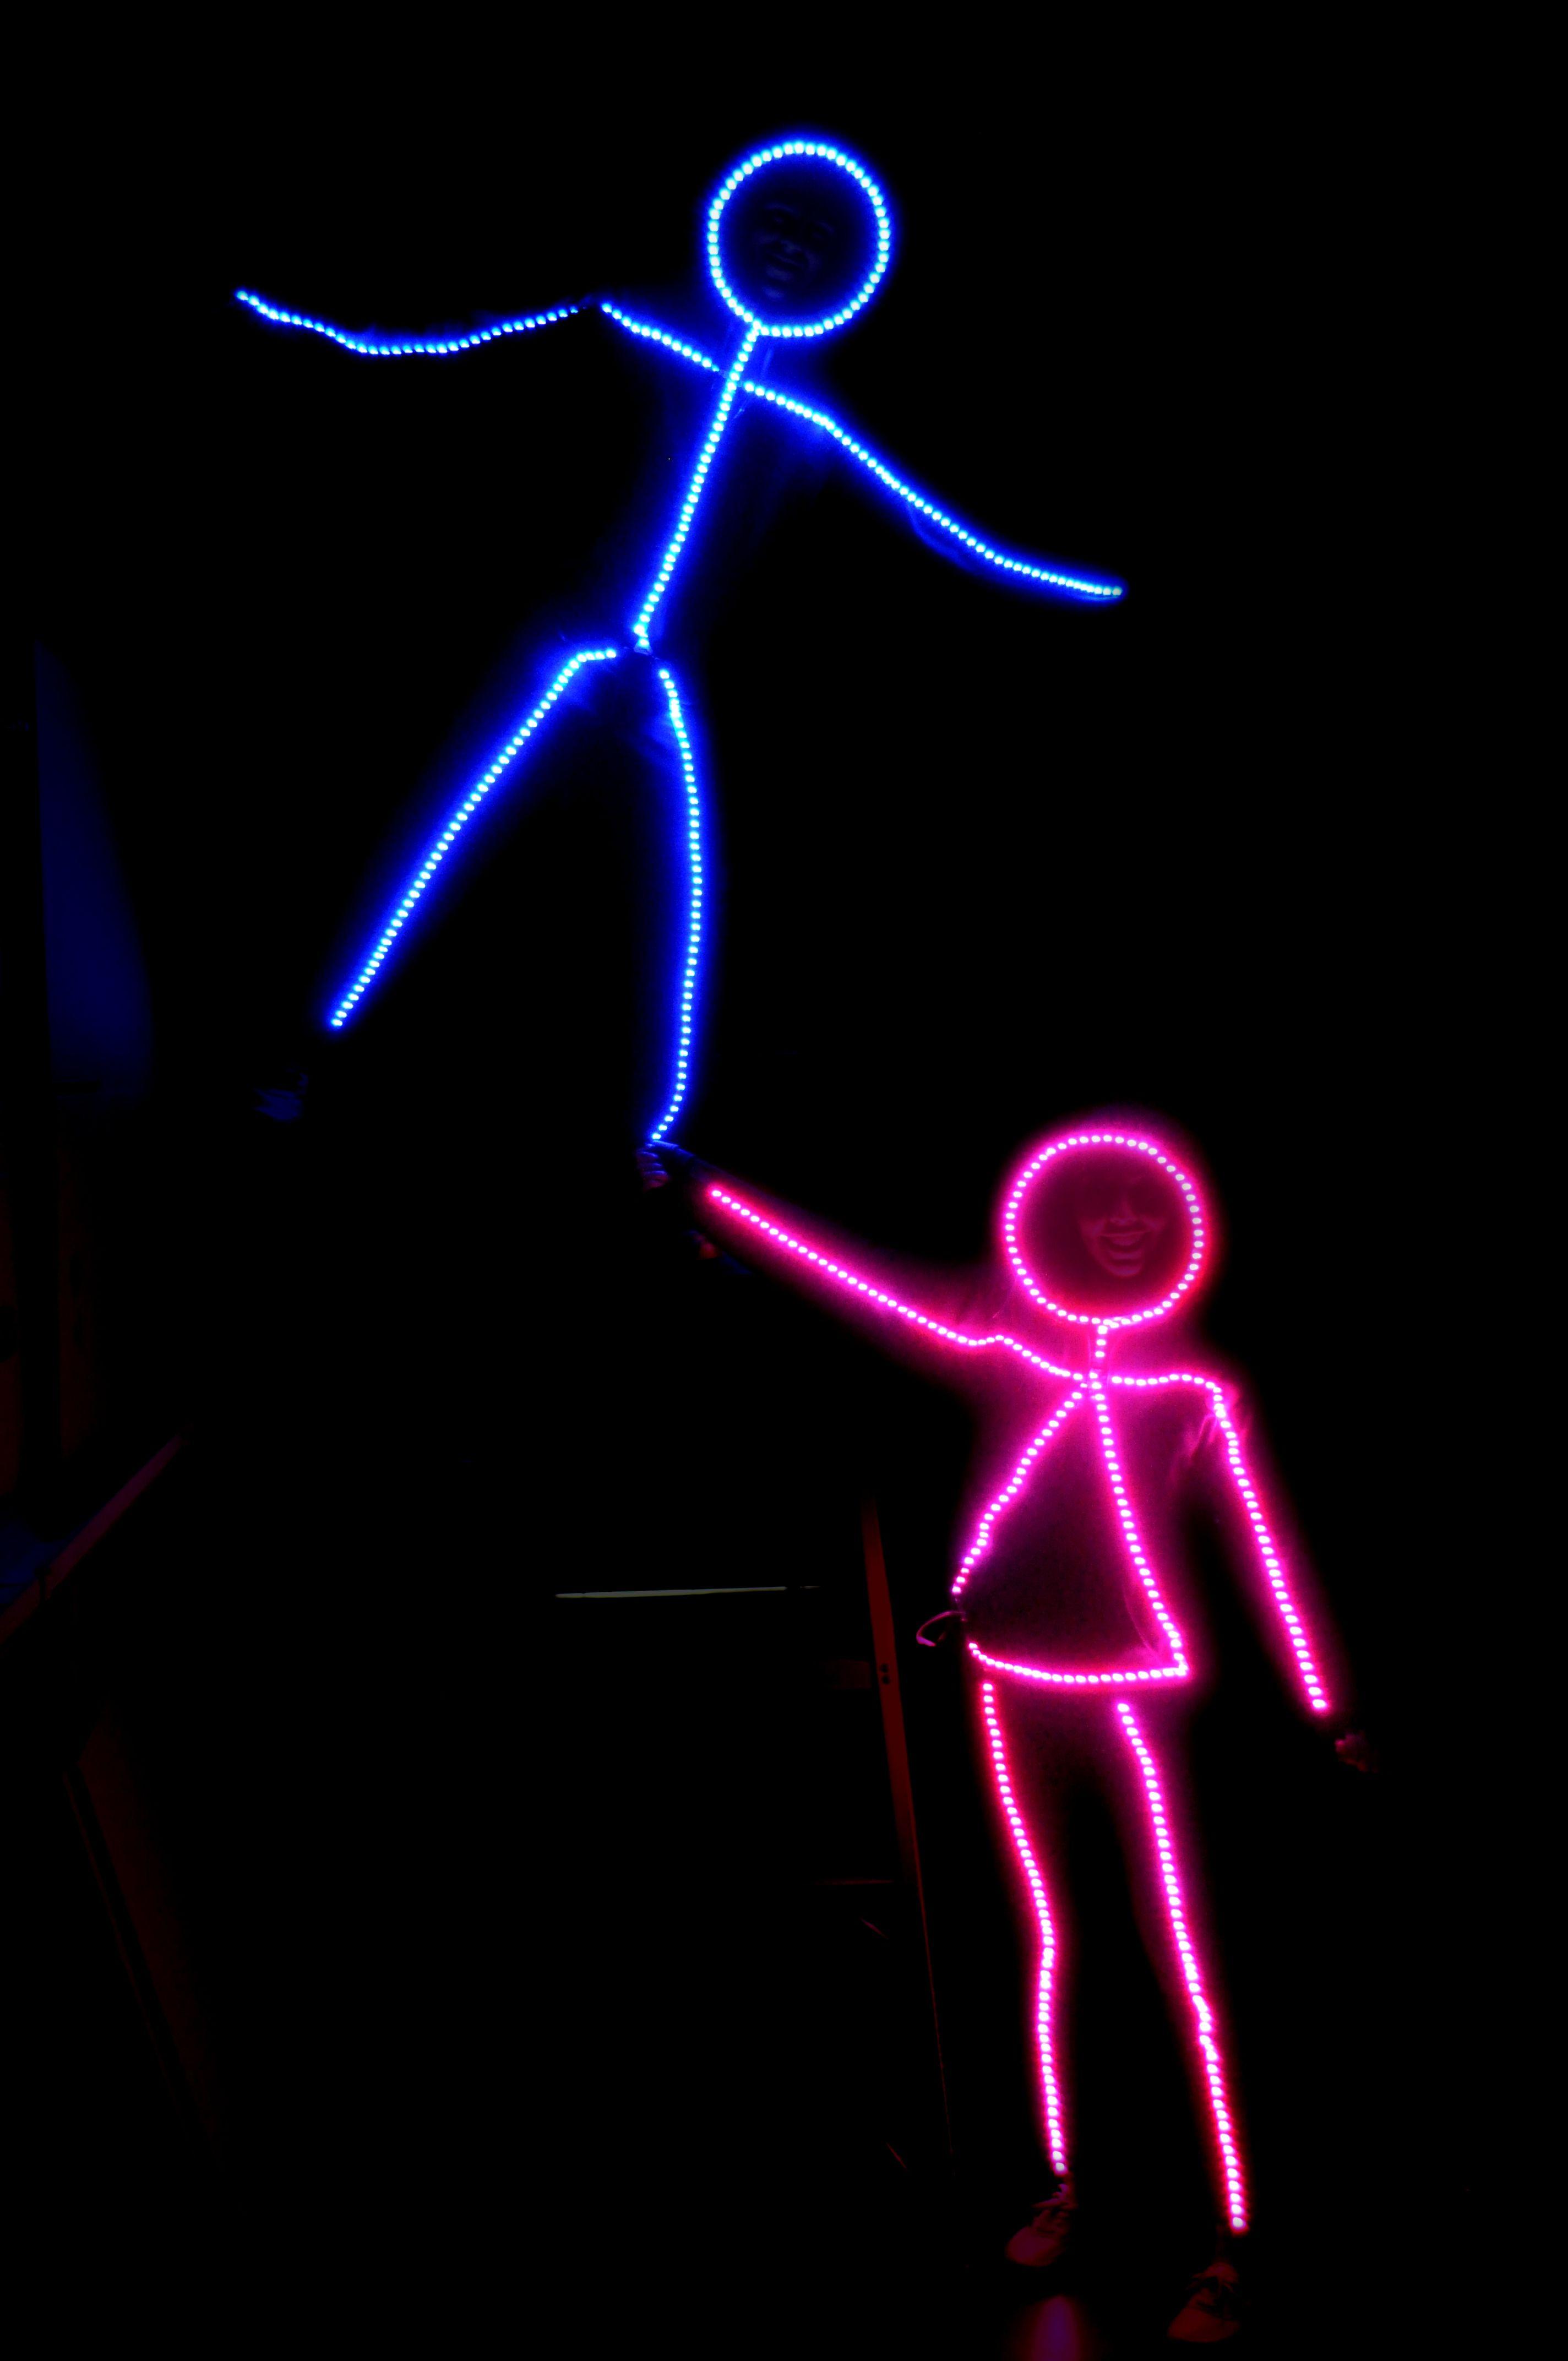 LED stick figure halloween costume Stick figure